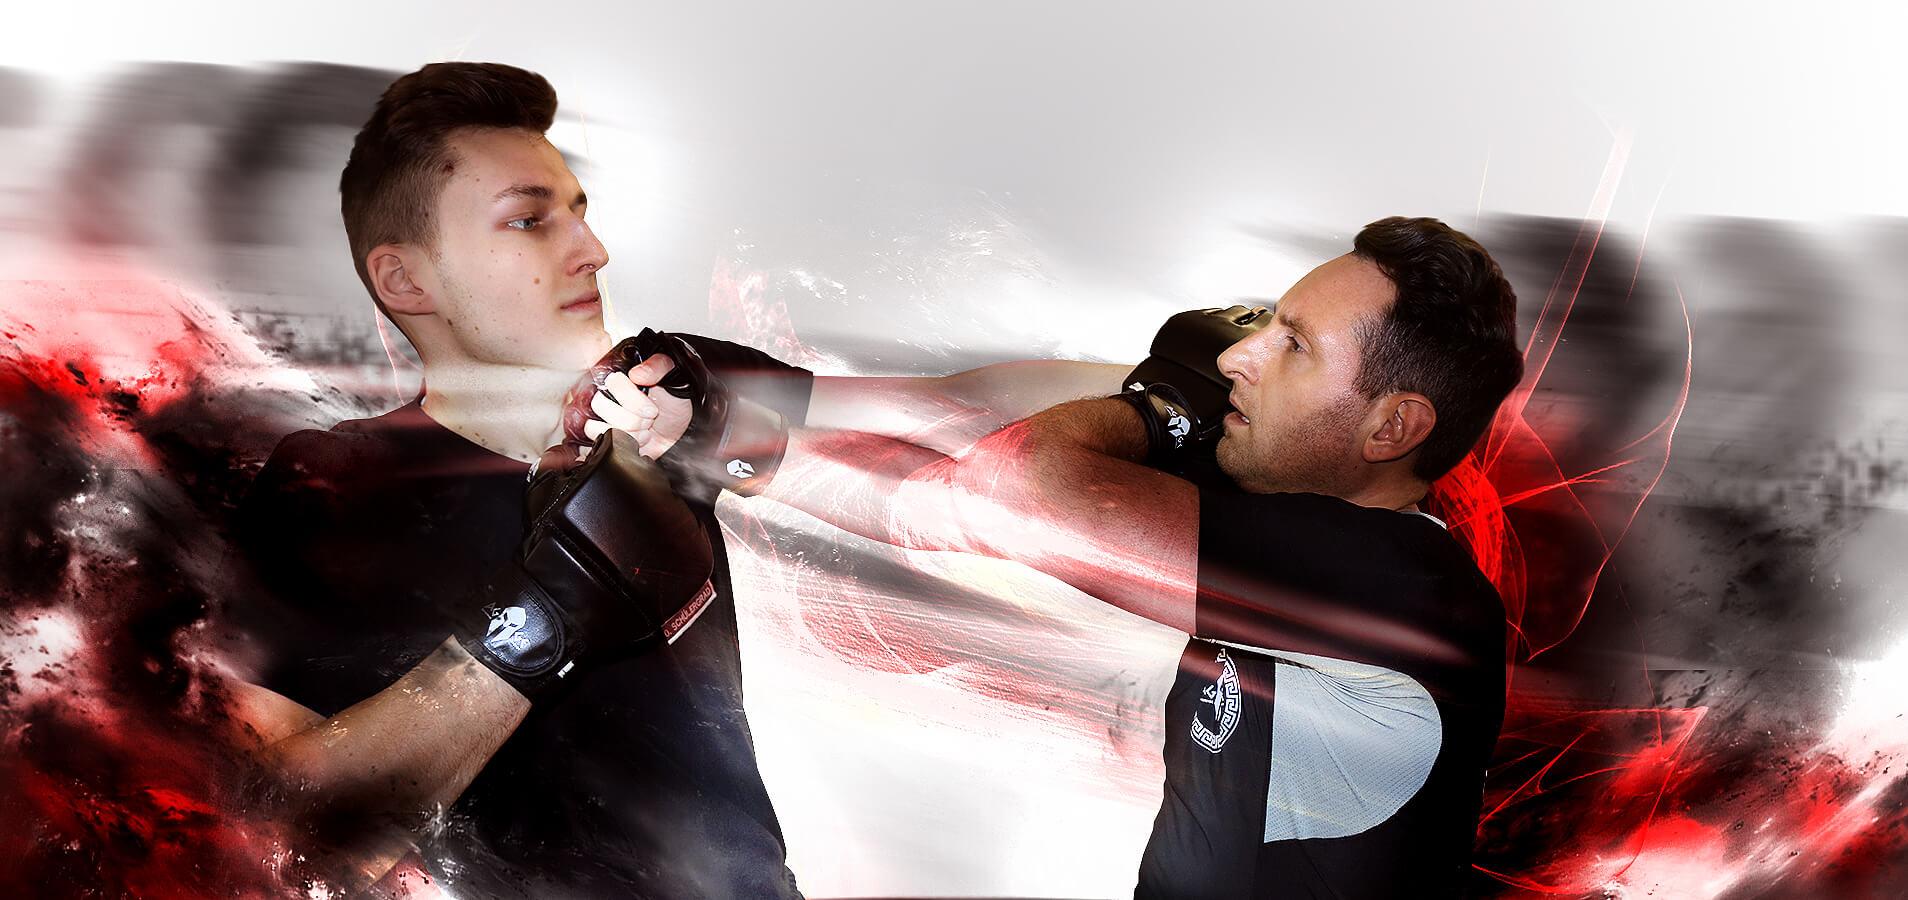 Ludwigsburg Wing Tsun Kung Fu Martial Arts Krav Maga MMA Kampfsport Selbstverteidigung